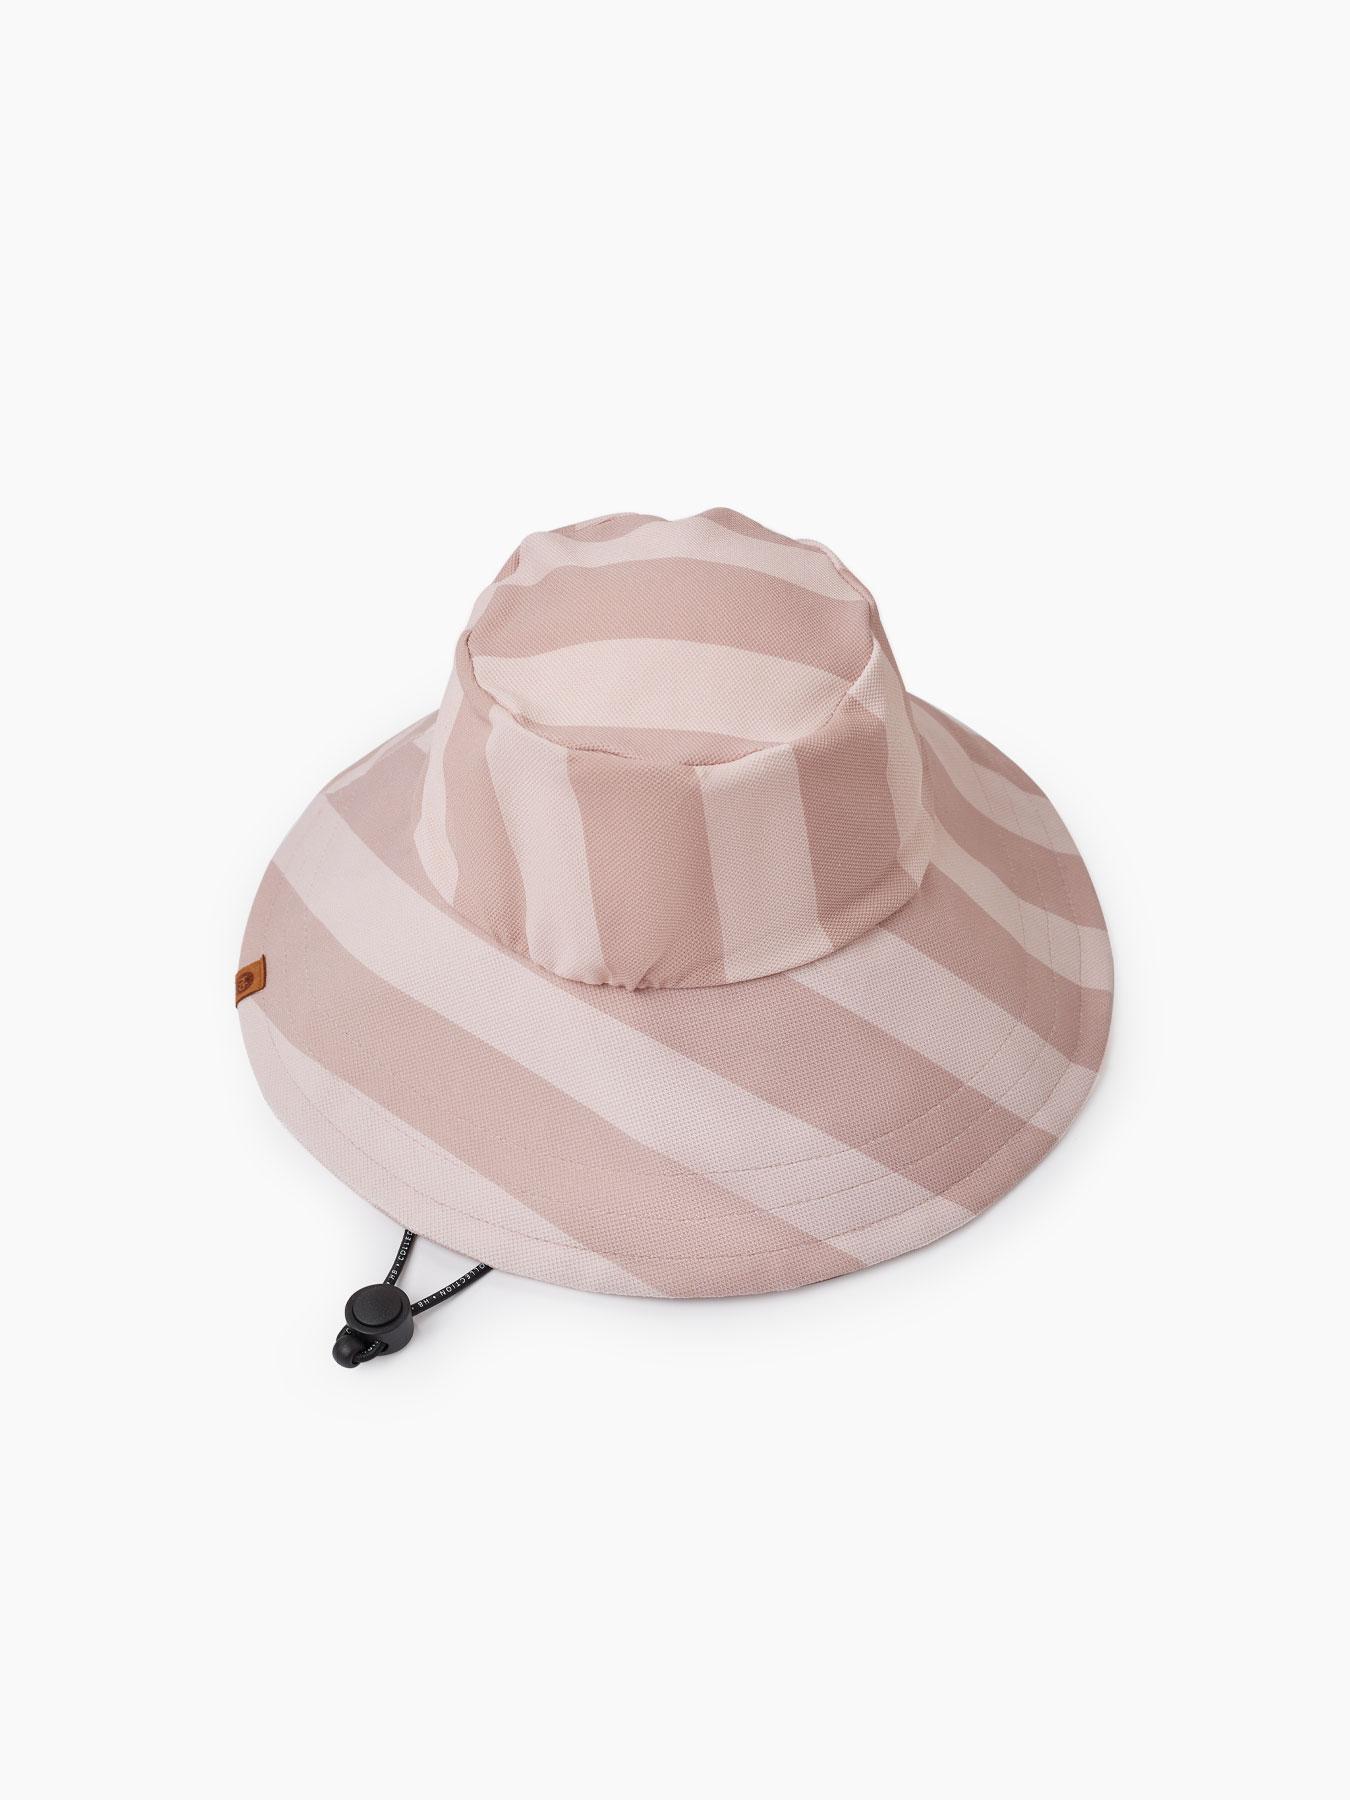 Купить 50625, Панама детская (pink&white, 52) Happy Baby розовый, белый 52,